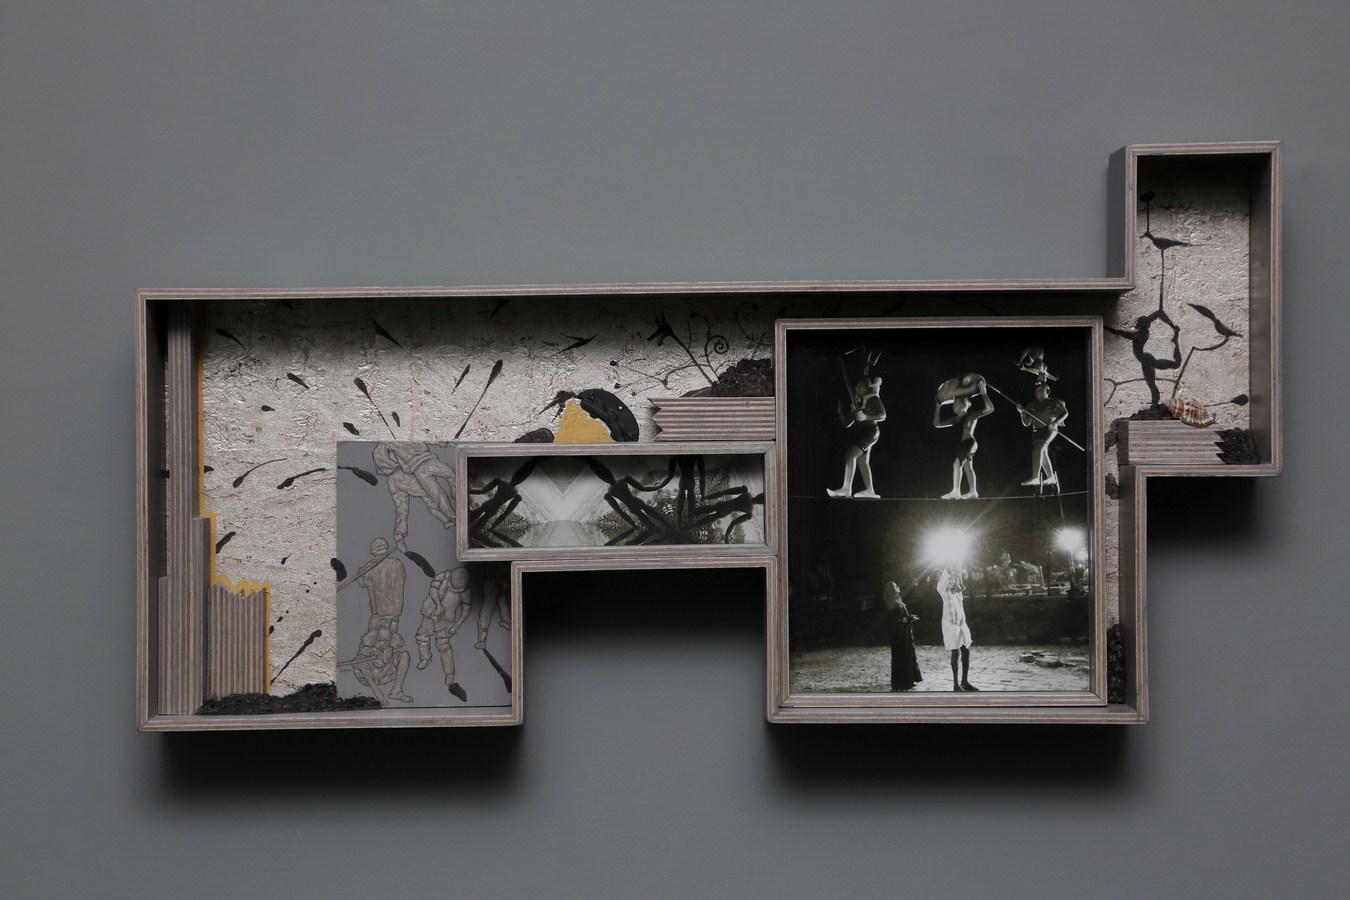 "Dweller of Metropolis - IX | Photograph, plywood, wood, acrylic, wallpaper, auto paint | 13"" x 25.5"" | 2017"